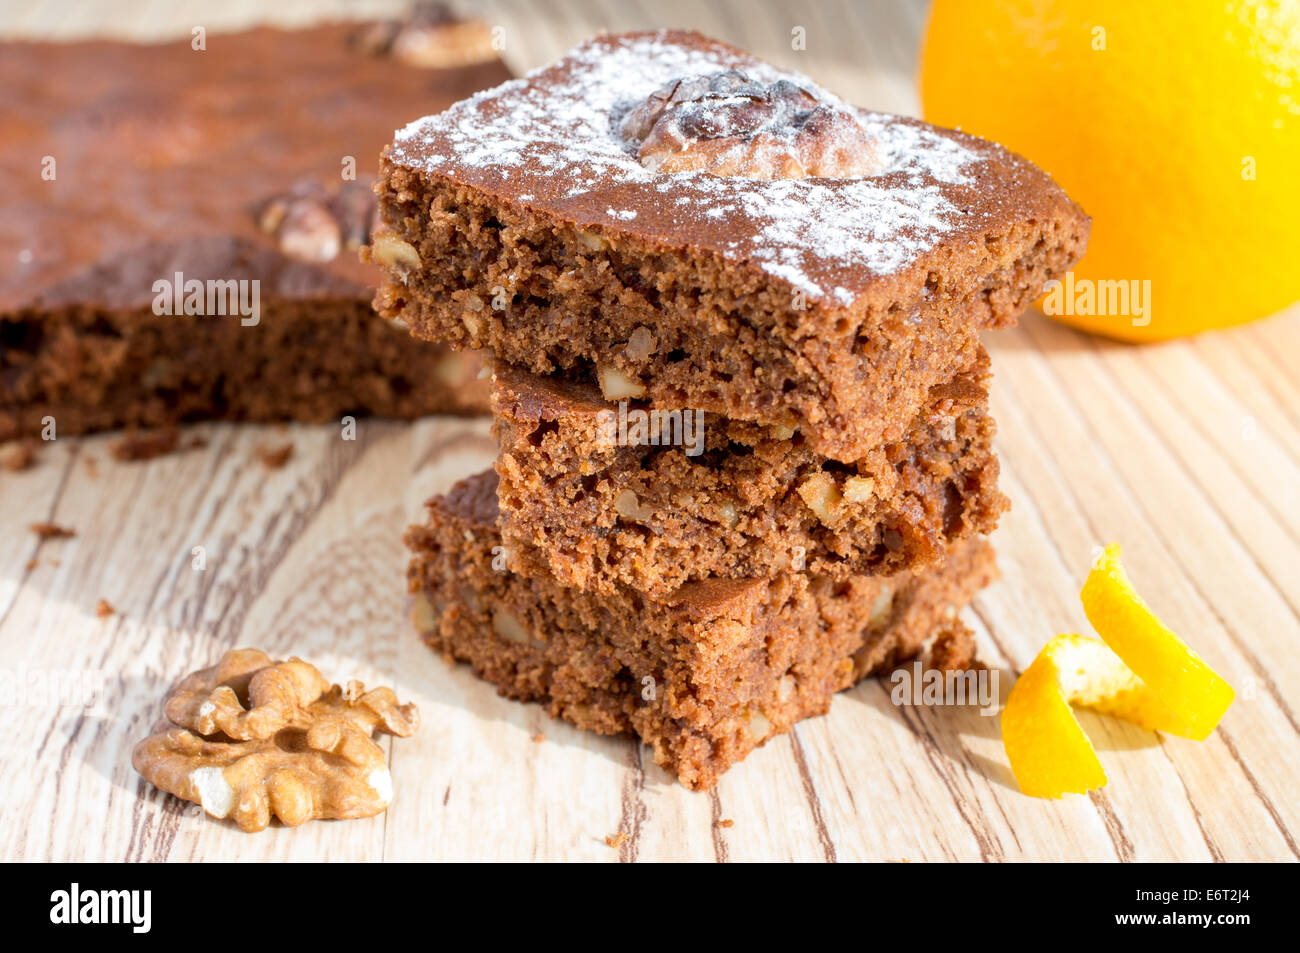 Brownie cake with orange and walnuts - Stock Image